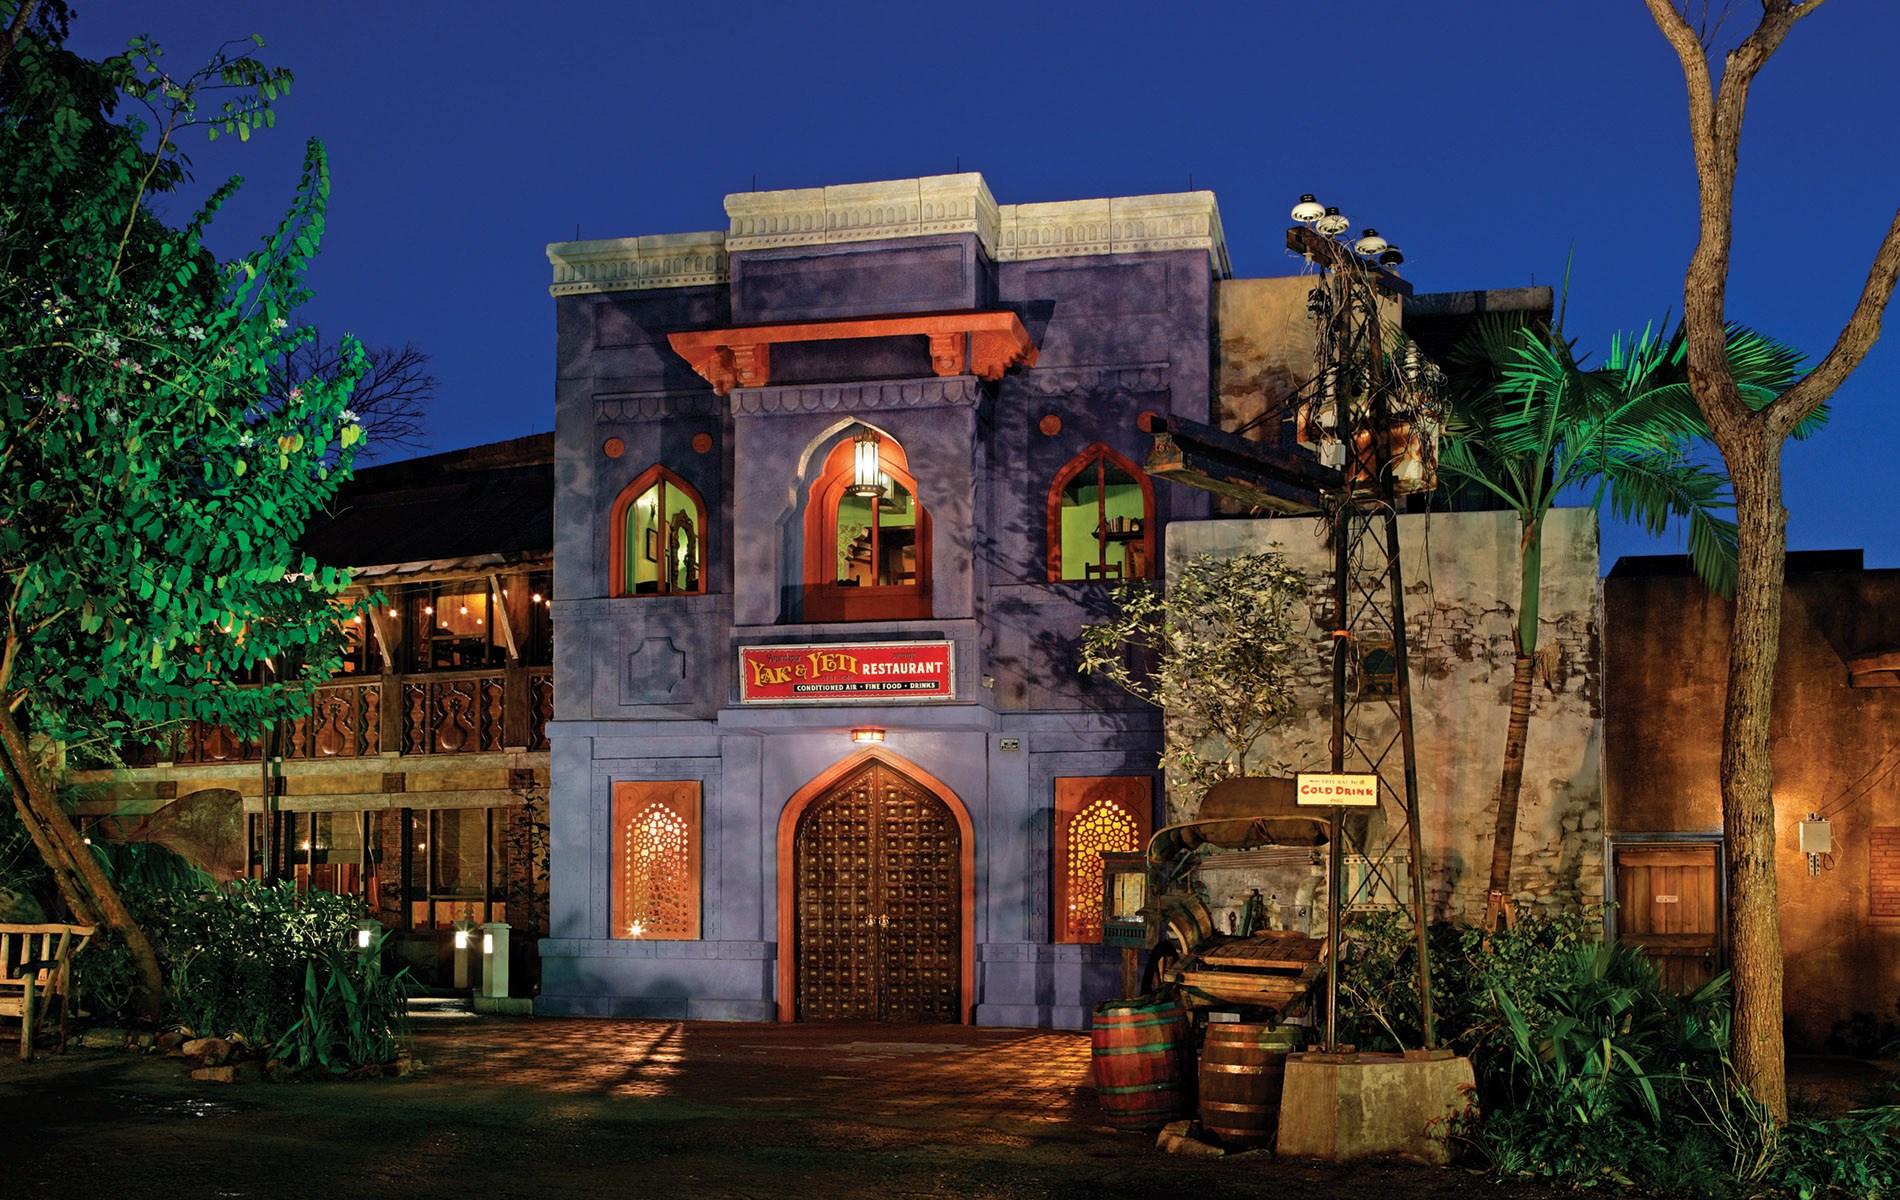 Lucian Marshall - Architectural Design - Disney World Animal Kingdom - Yak & Yeti Architectural Design